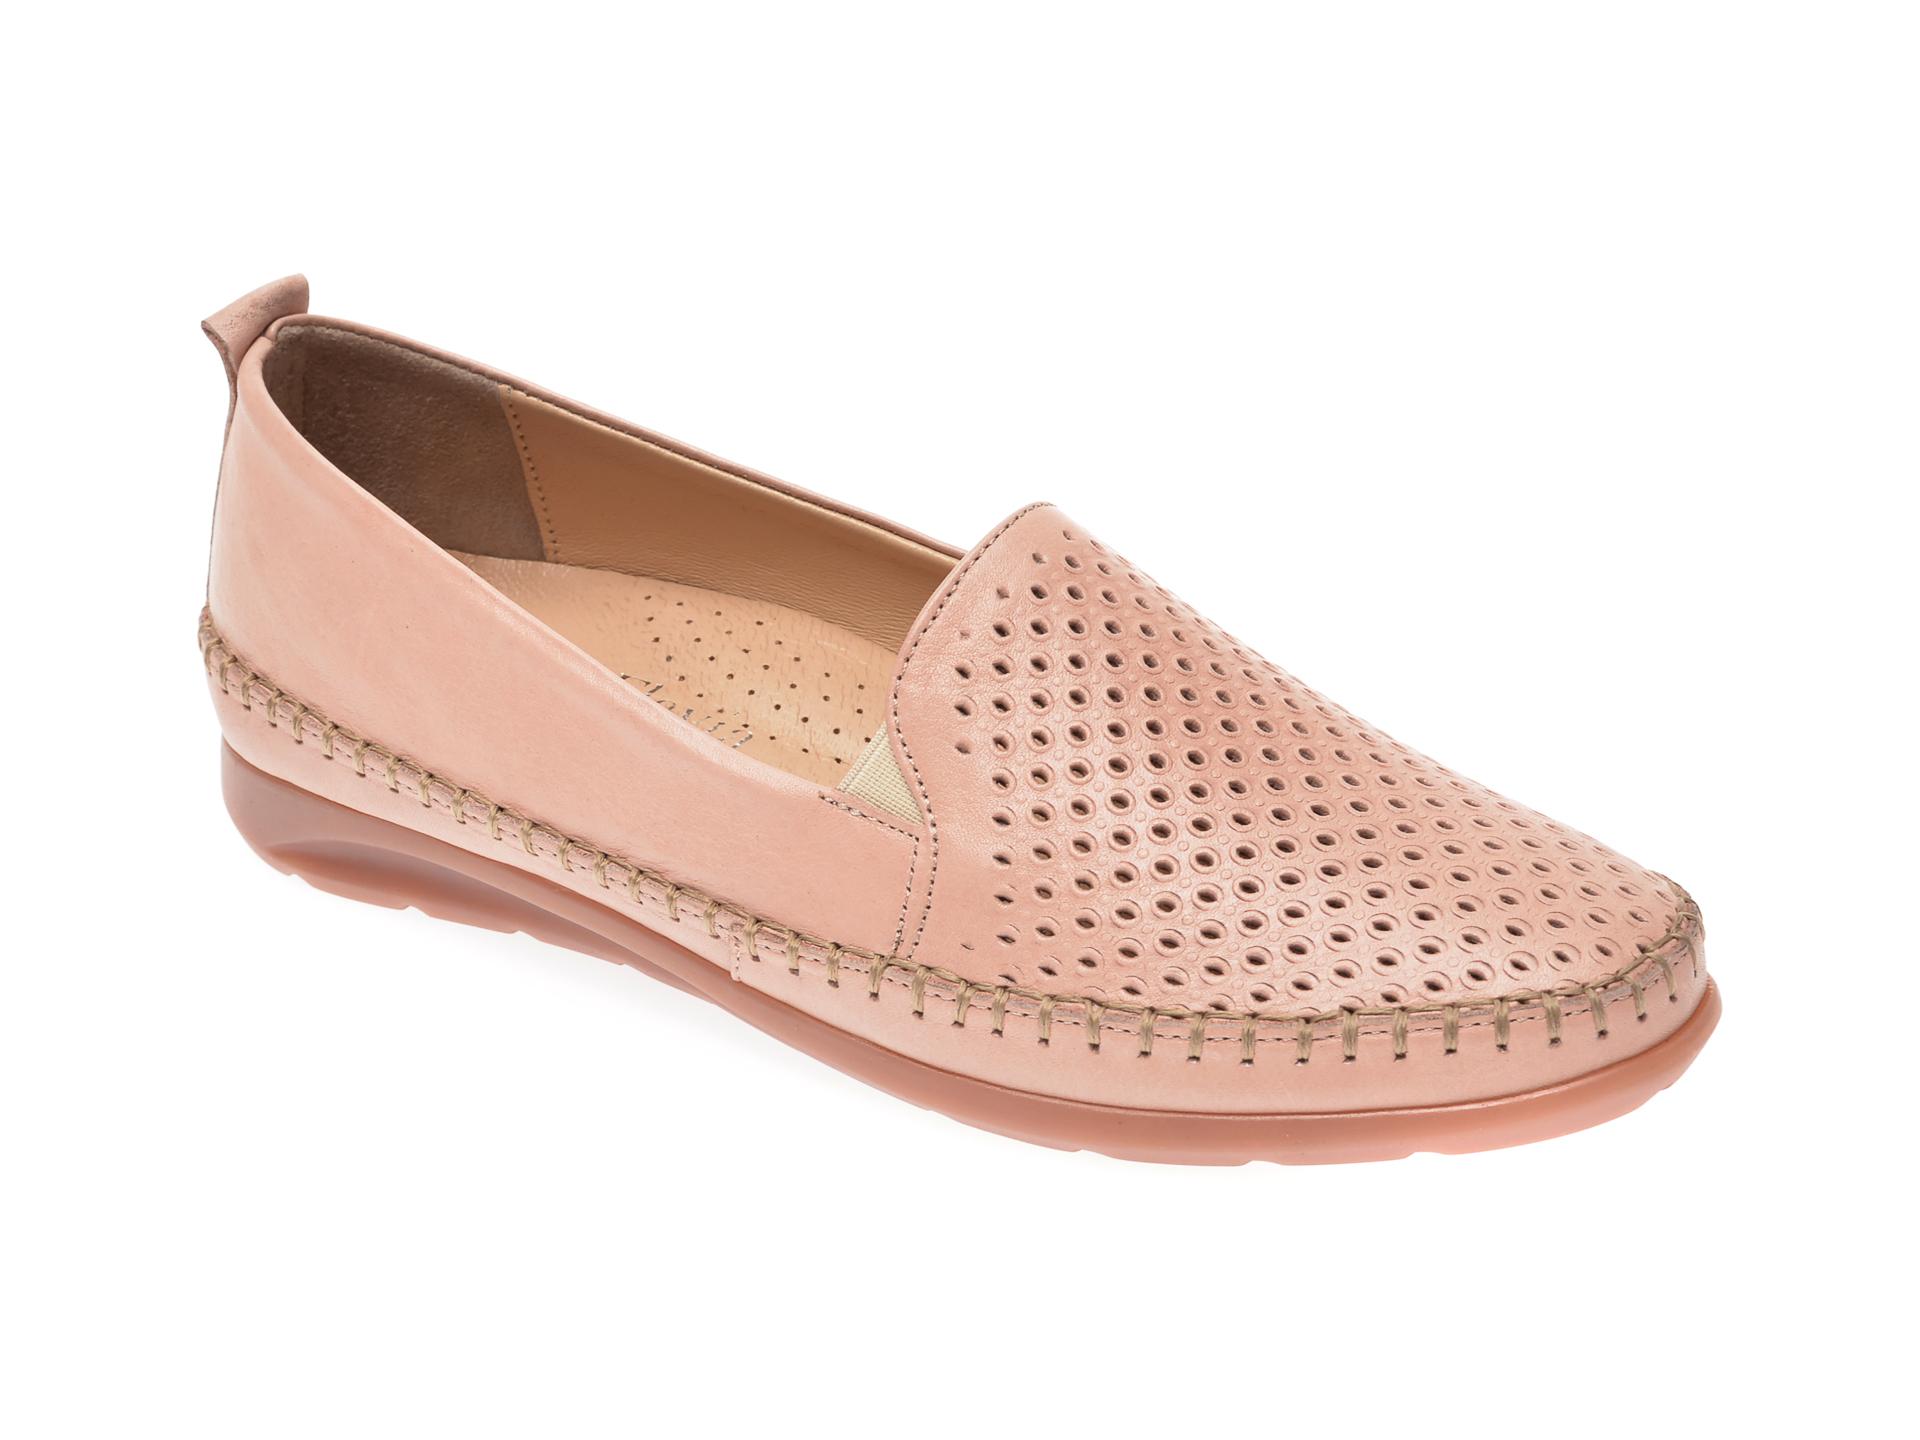 Pantofi FLAVIA PASSINI roz, 19305, din piele naturala